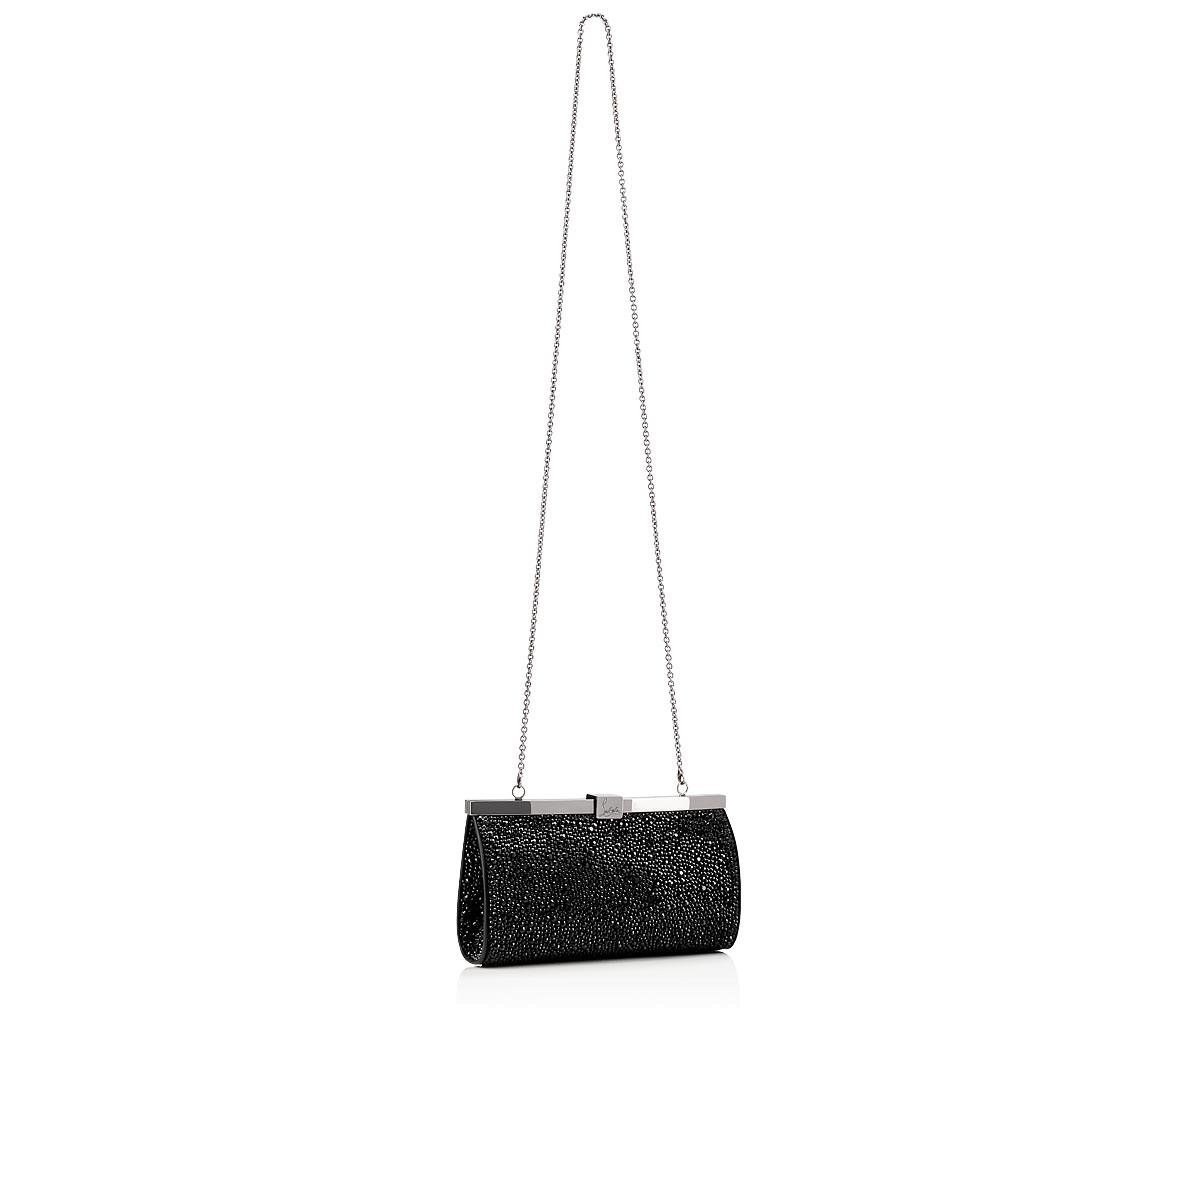 Bags - Palmette Small Clutch - Christian Louboutin